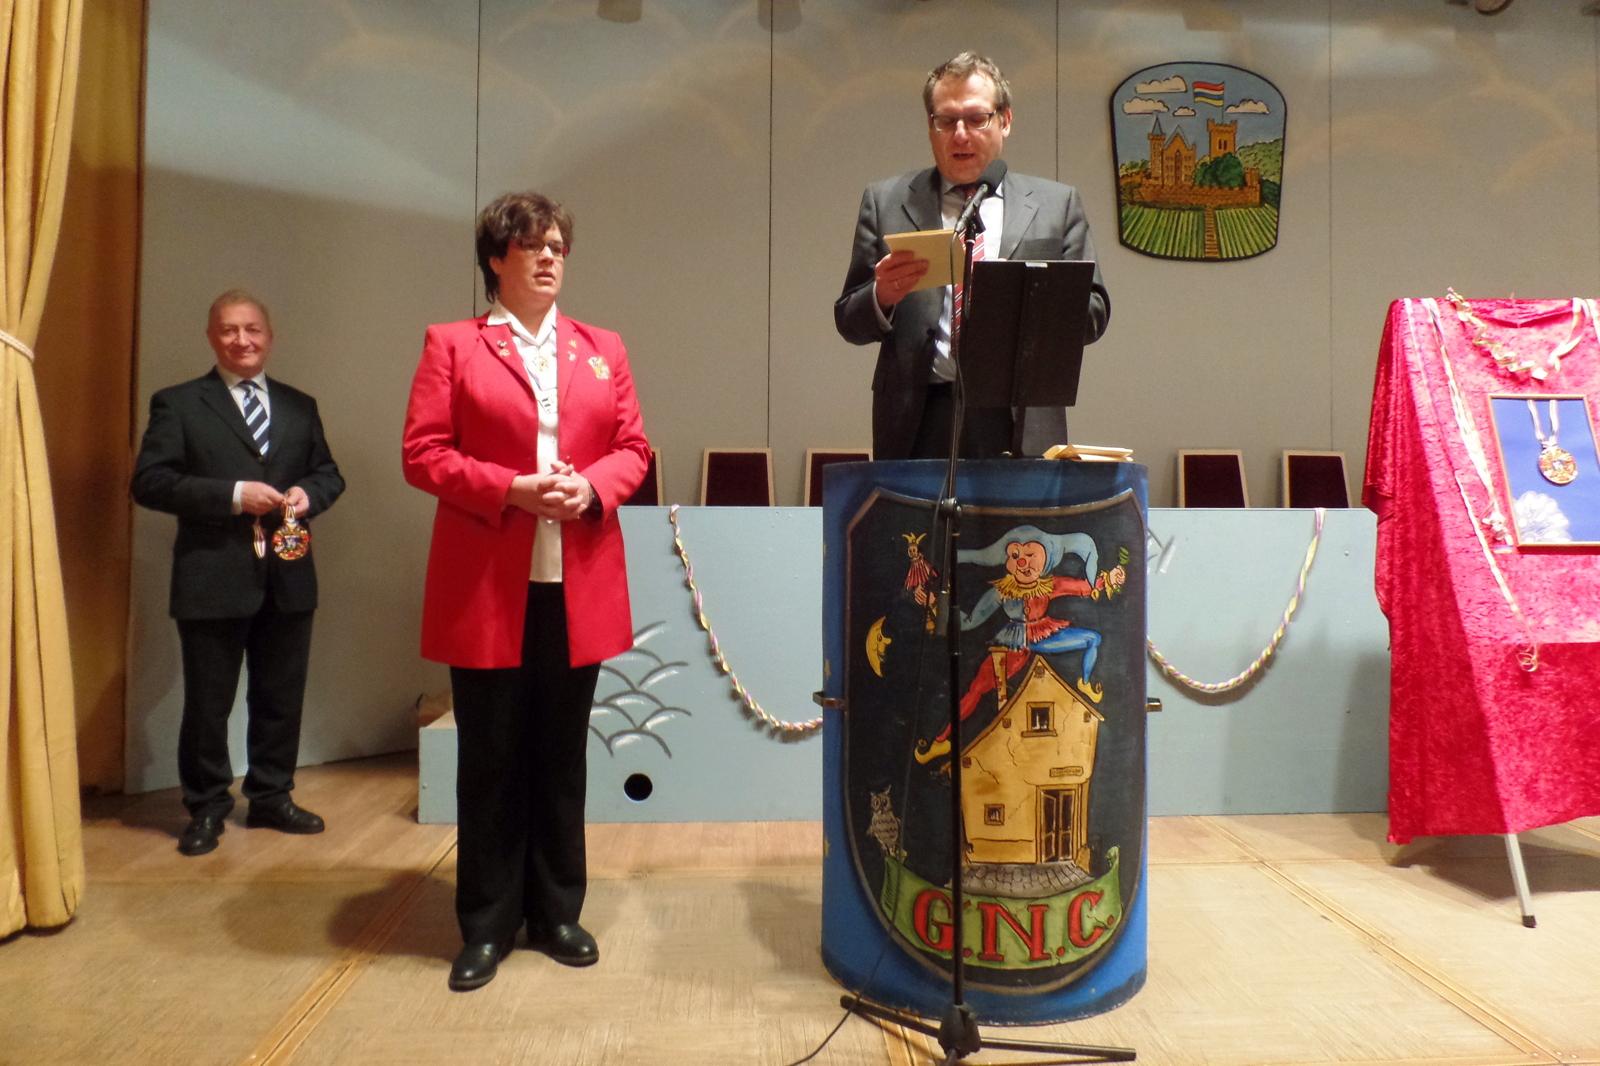 Unsere Vizepräsidentin Manuela Haas erhält den Binger Stadtorden 2016